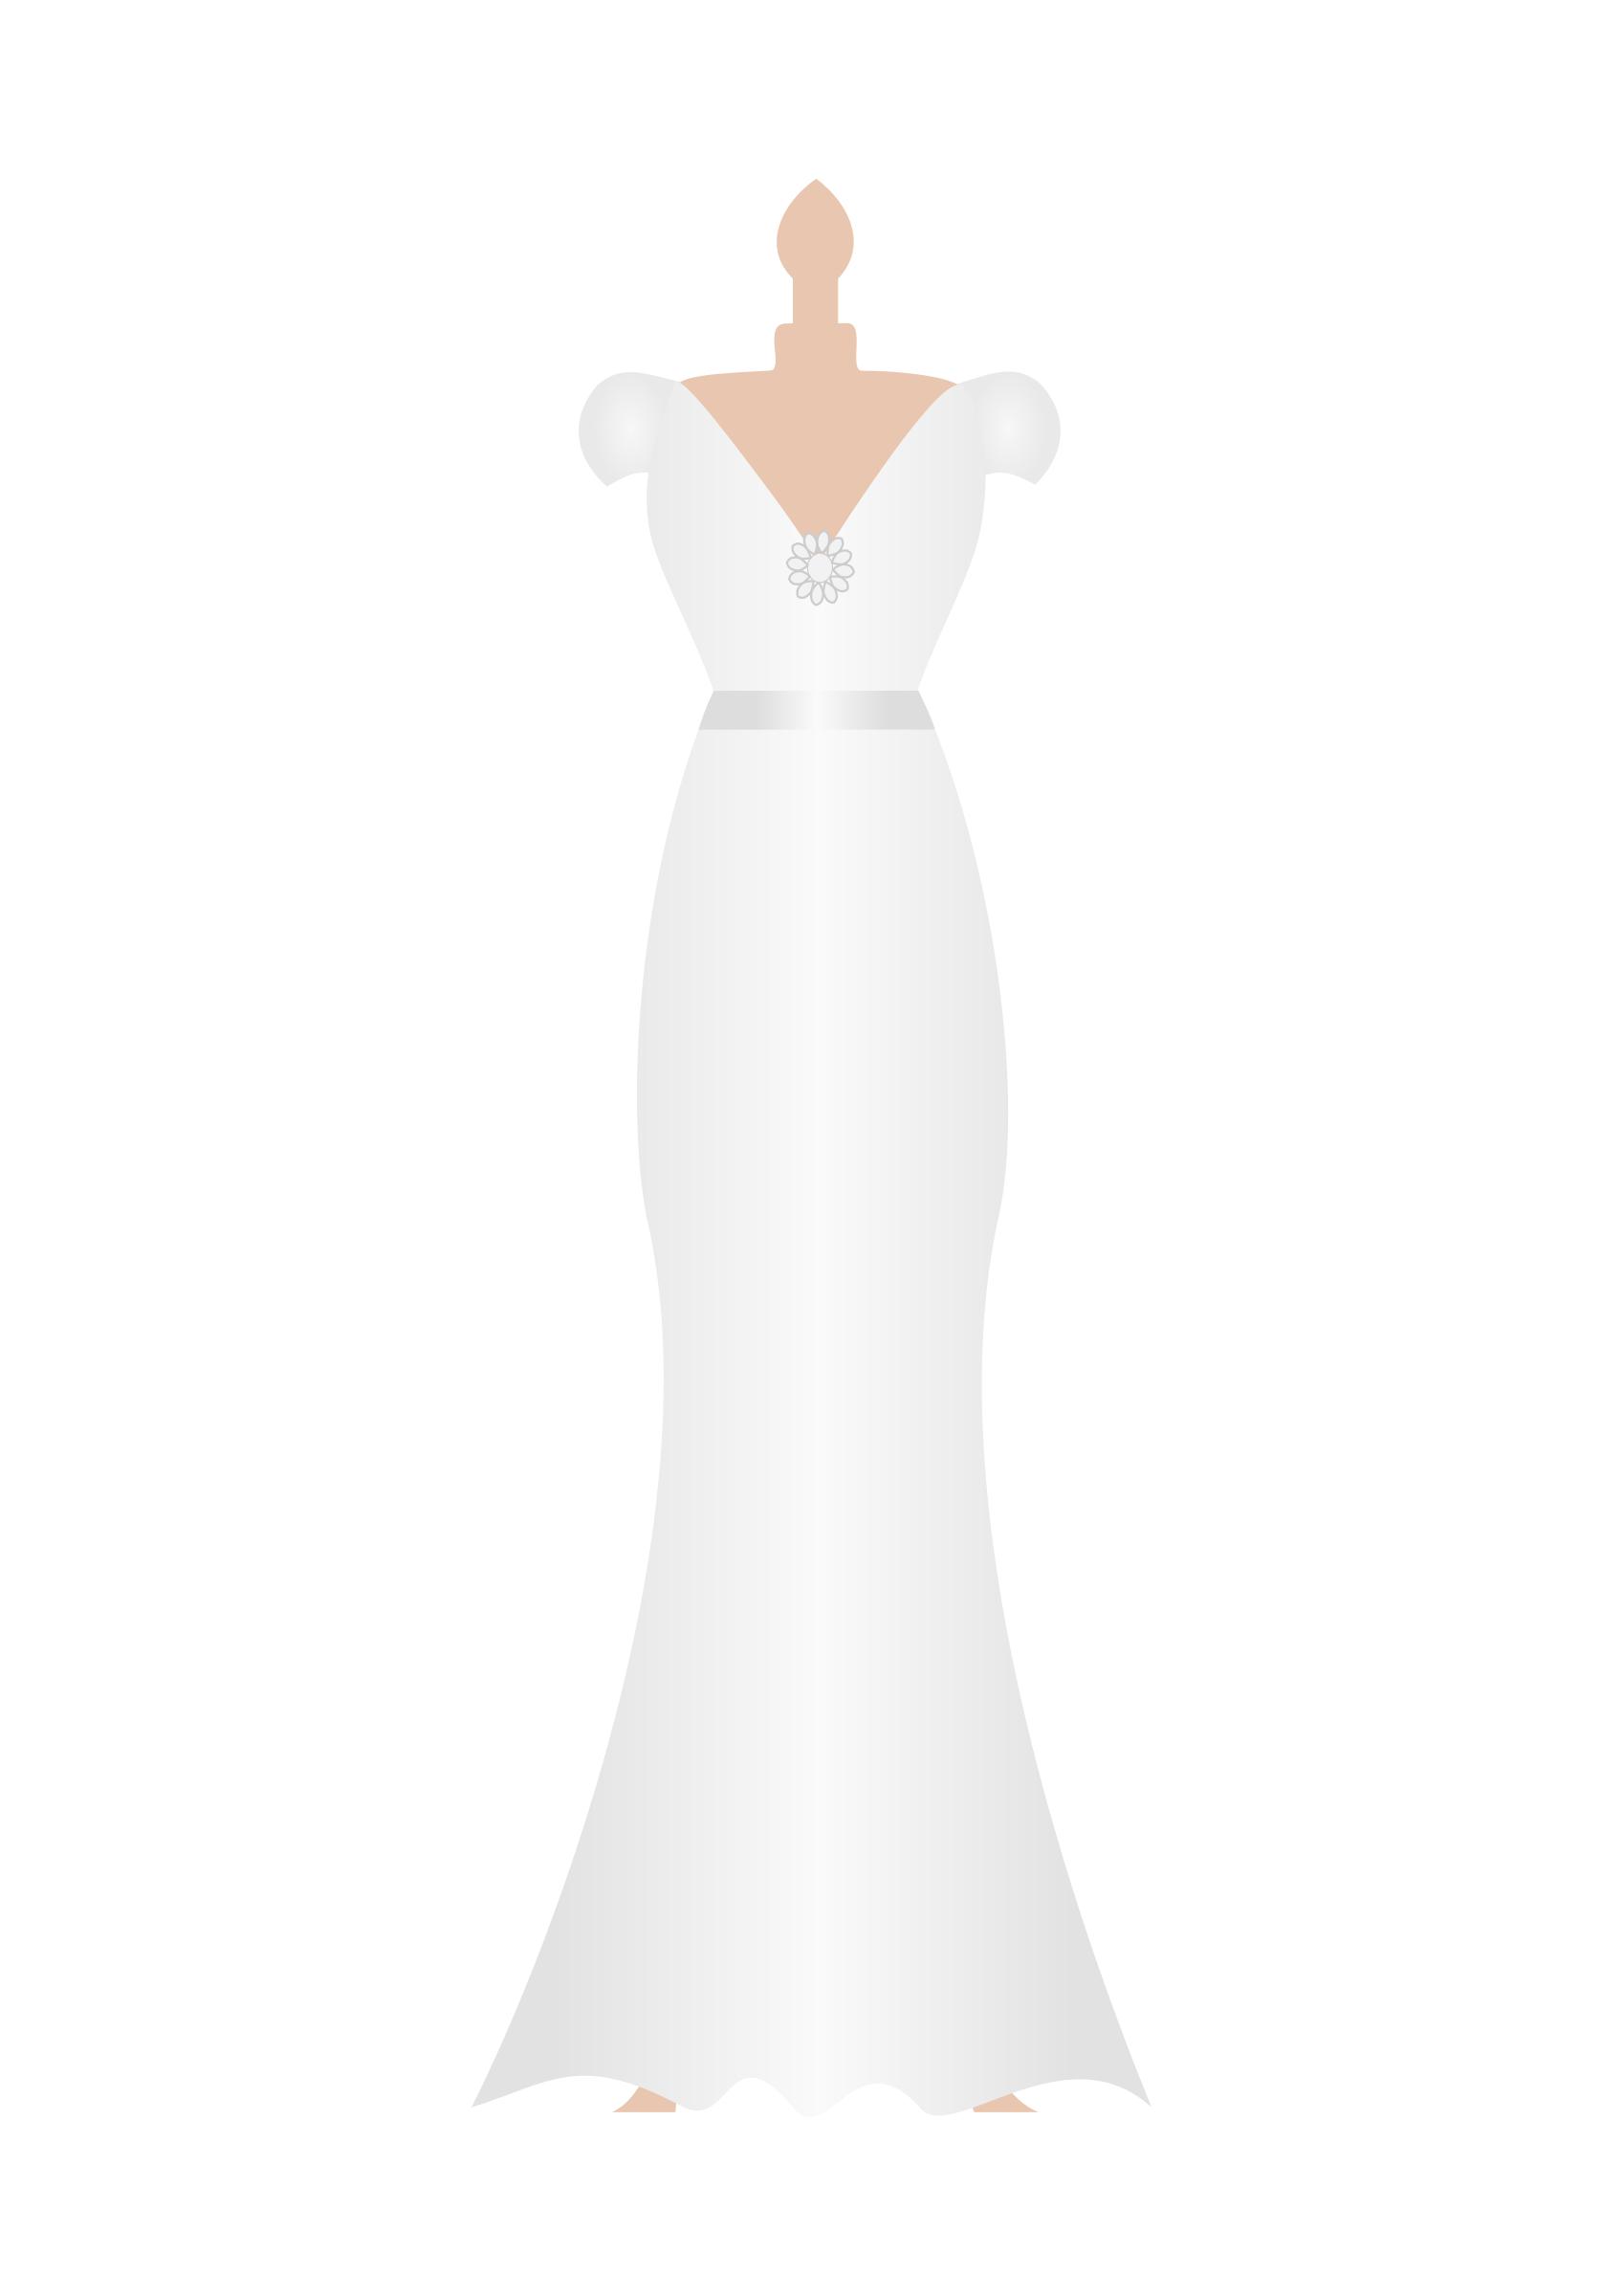 Clipart wedding dress clipart clip transparent wedding dress digital vector clip art wedding gown clipart design ... clip transparent